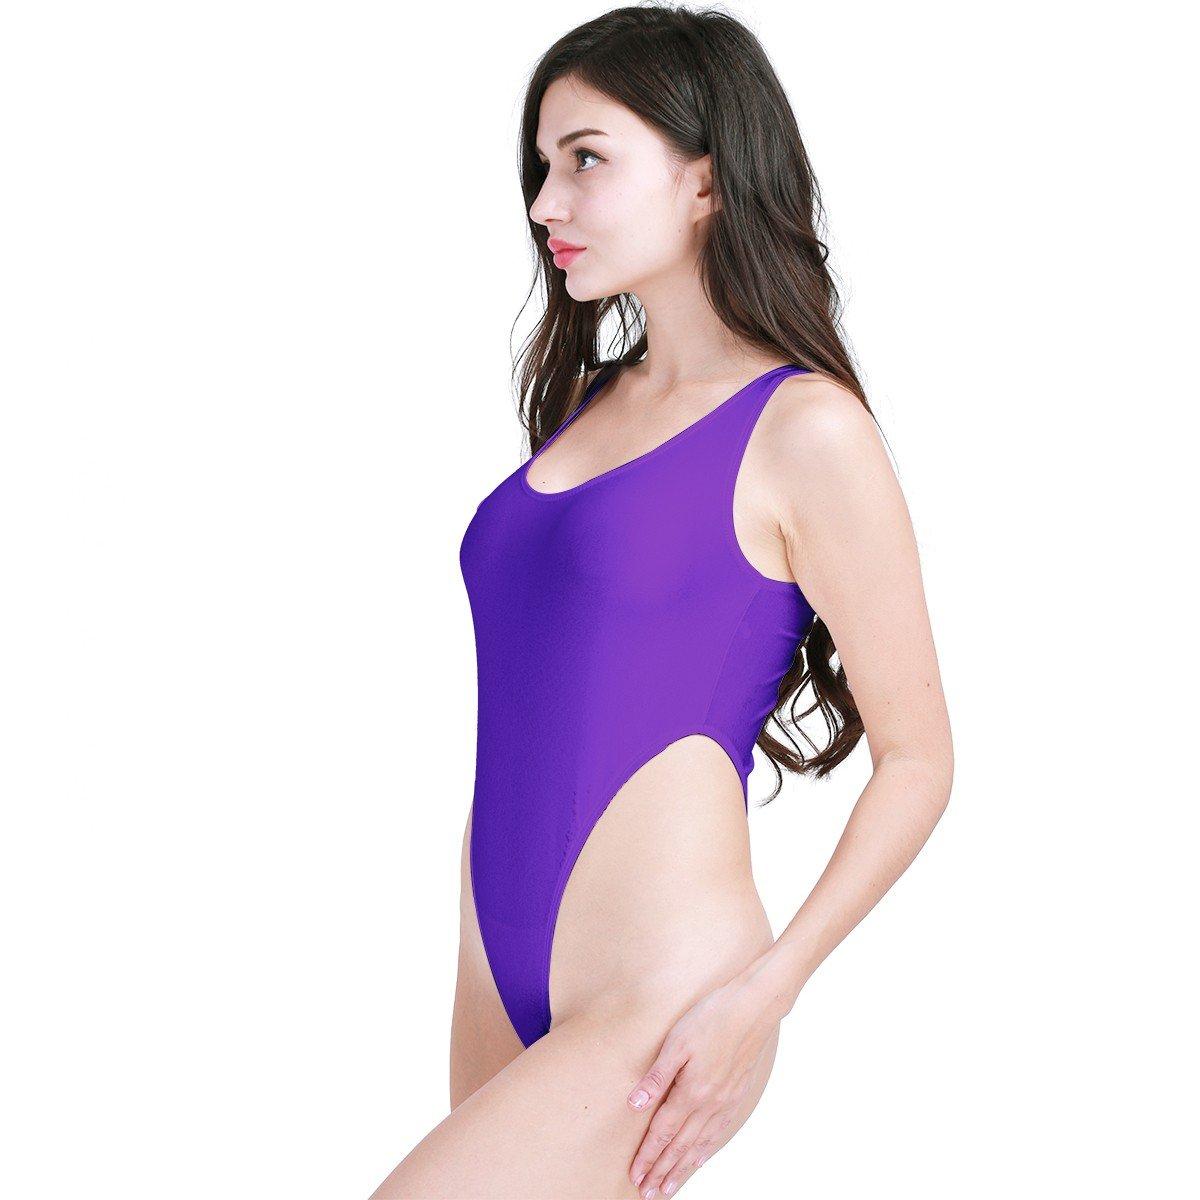 FEESHOW Women s One Piece High Cut Swimsuit Bodysuit Leotard Top Purple One  Size at Amazon Women s Clothing store  5cc3770f2d3b